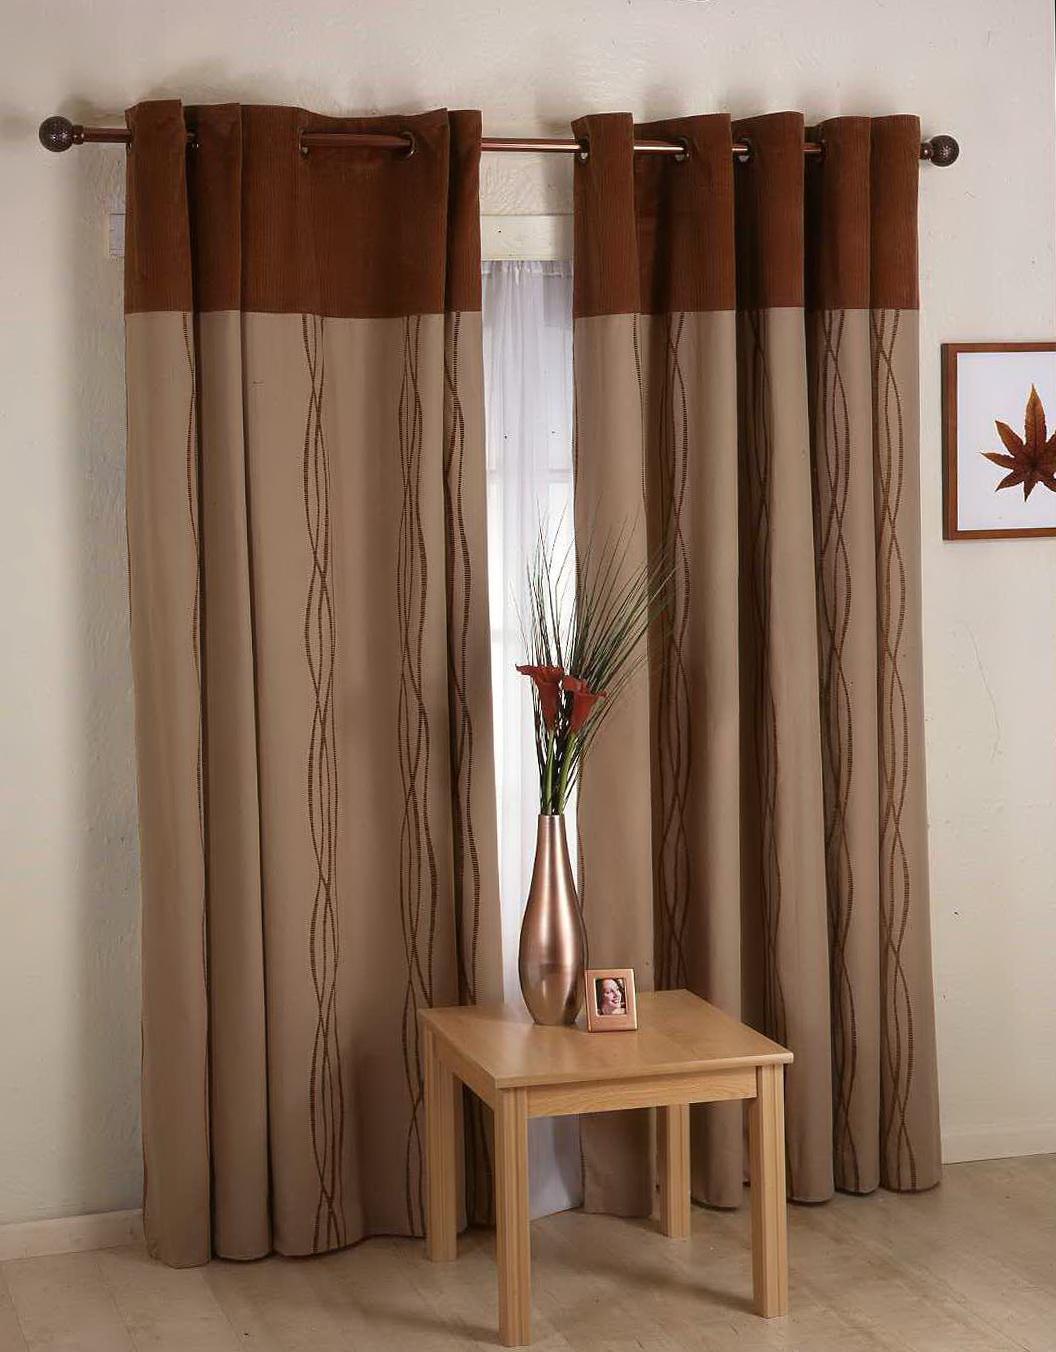 Modern Curtain Ideas For Small Windows